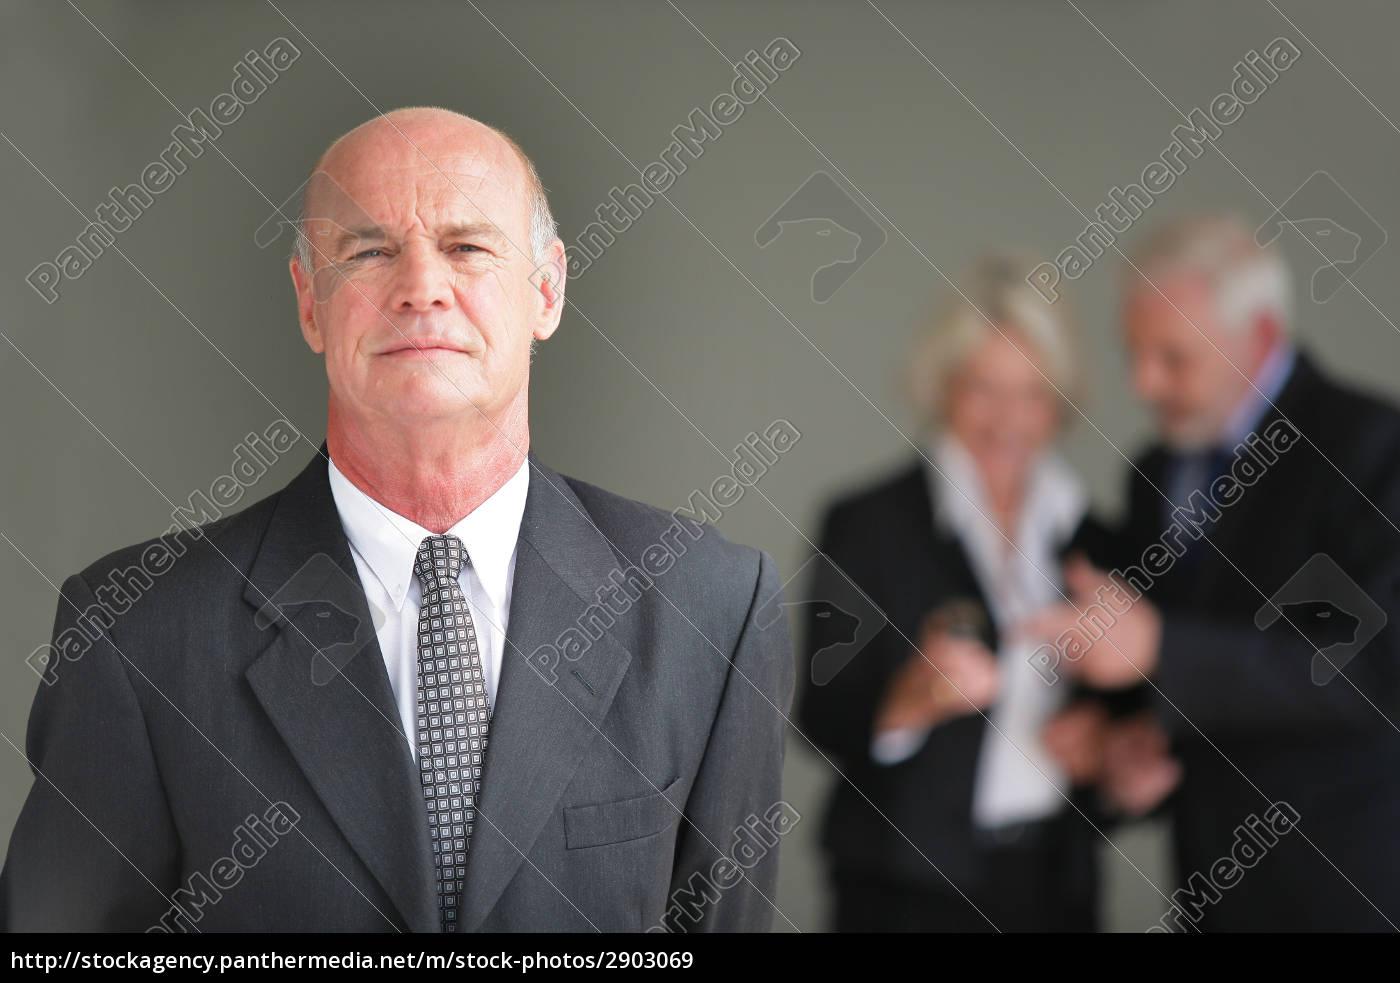 portrait, of, a, senior, man, in - 2903069